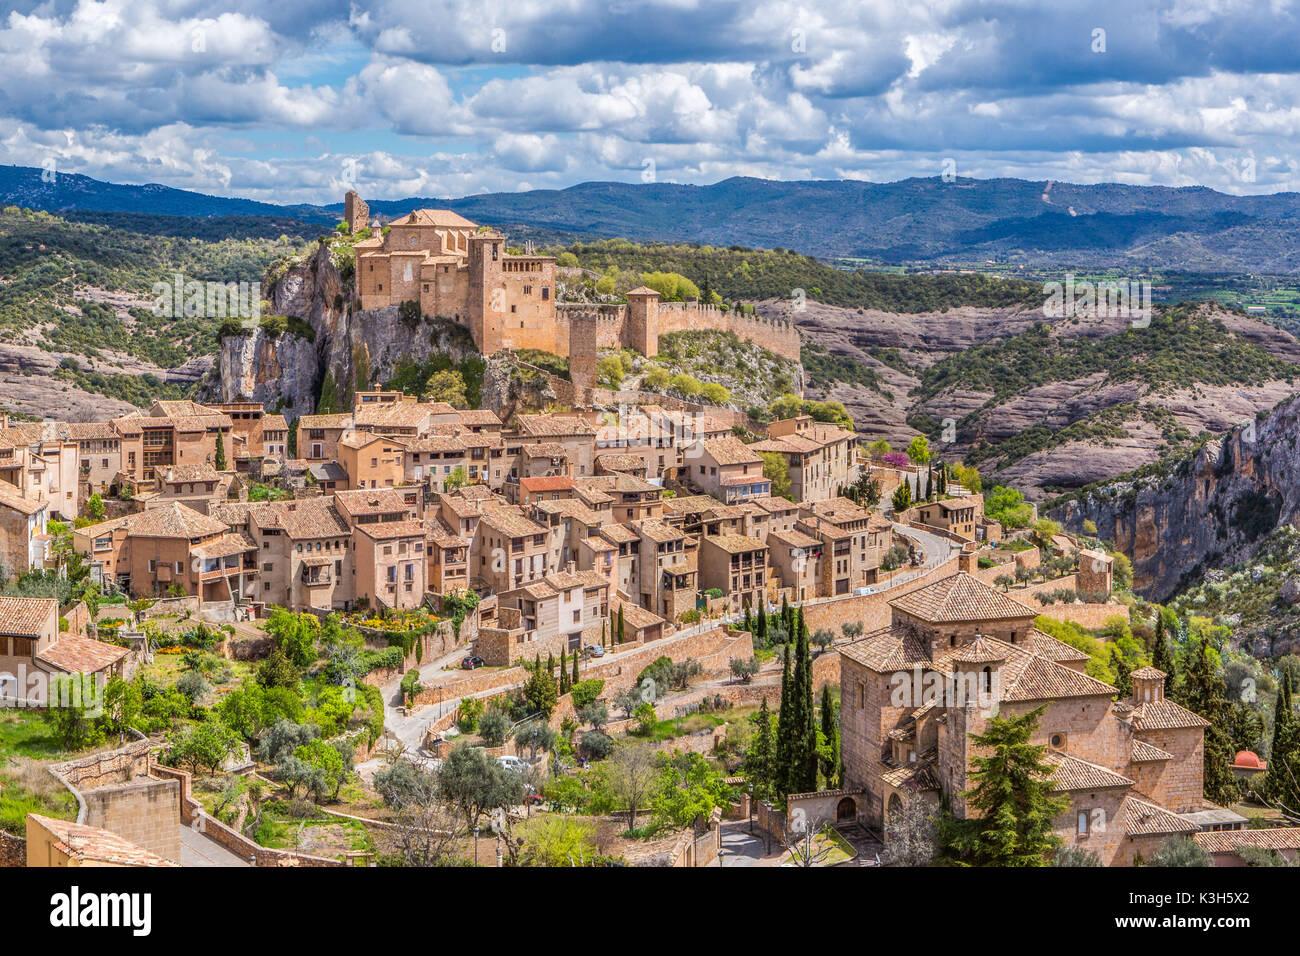 Spain, Huesca province, Alquezar City, San Miguel Church and Santa Maria Colegiata - Stock Image